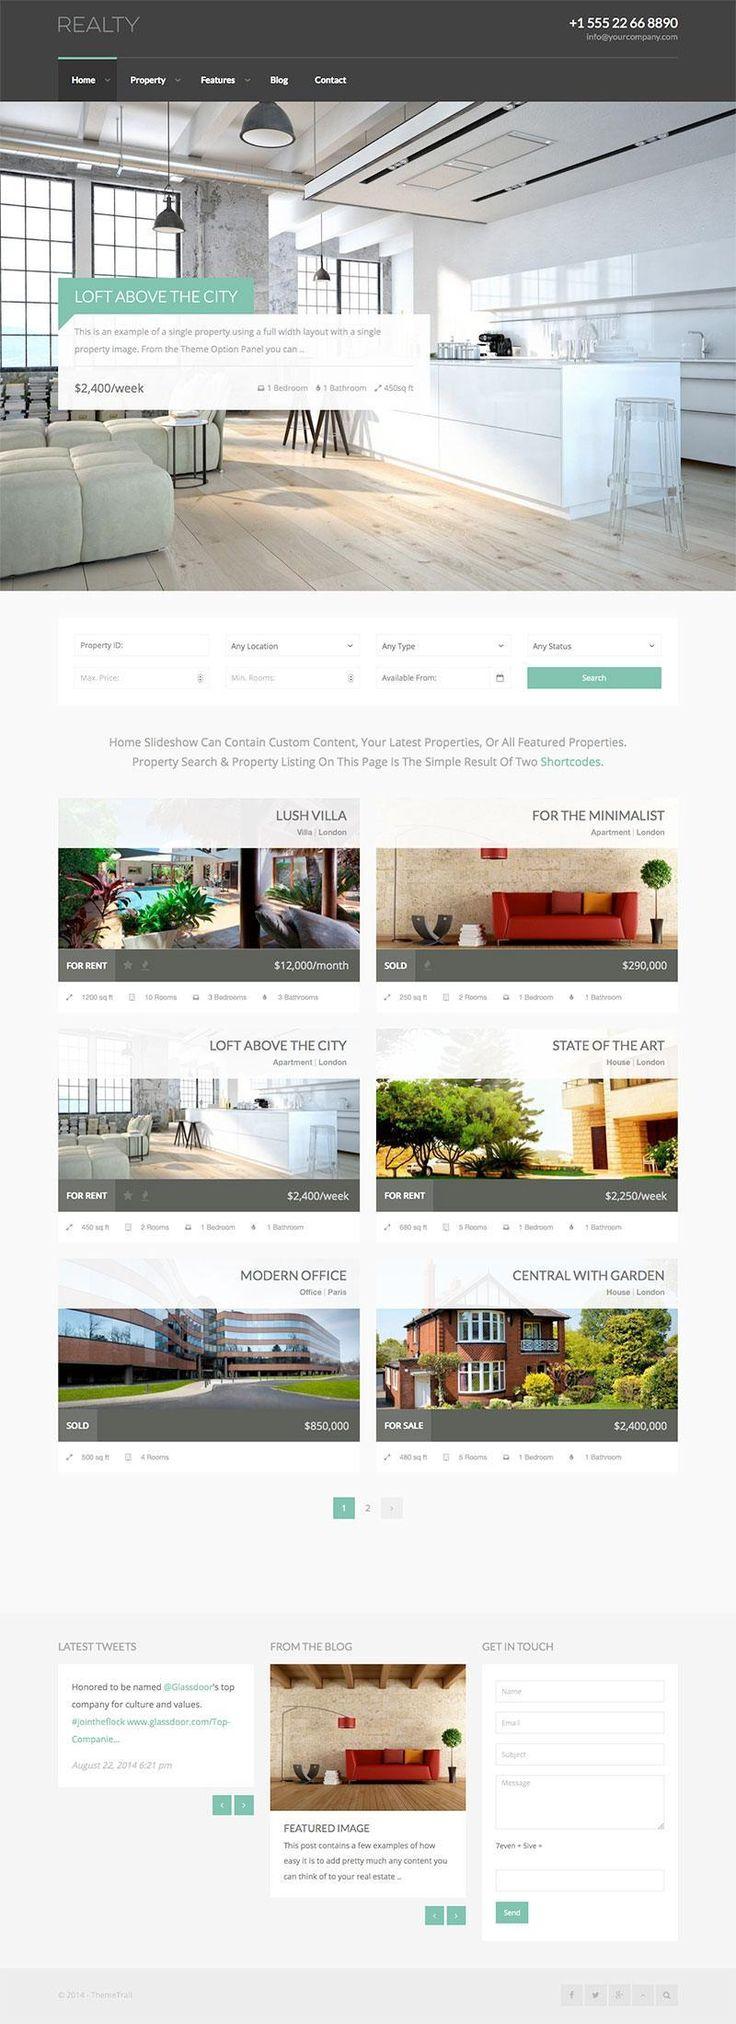 Realty Responsive Real Estate WordPress Theme - WPExplorer